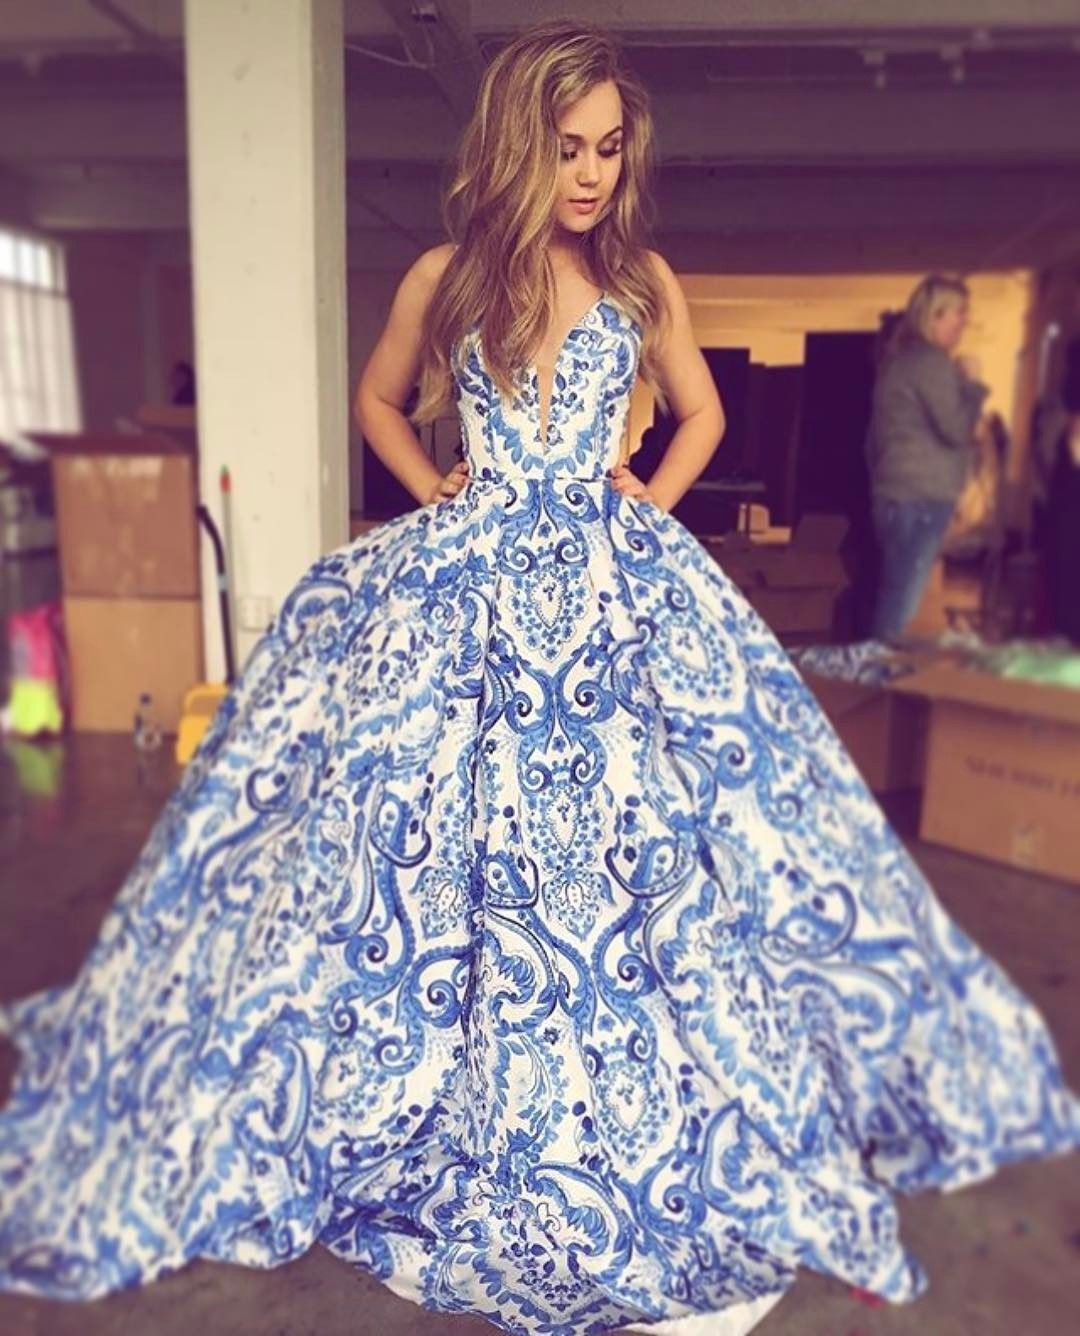 54cf9395f9e17 floral long prom dress, 2019 prom dress, elegant ball gown with pockets  #promdresses #ballgown #graduationdresses